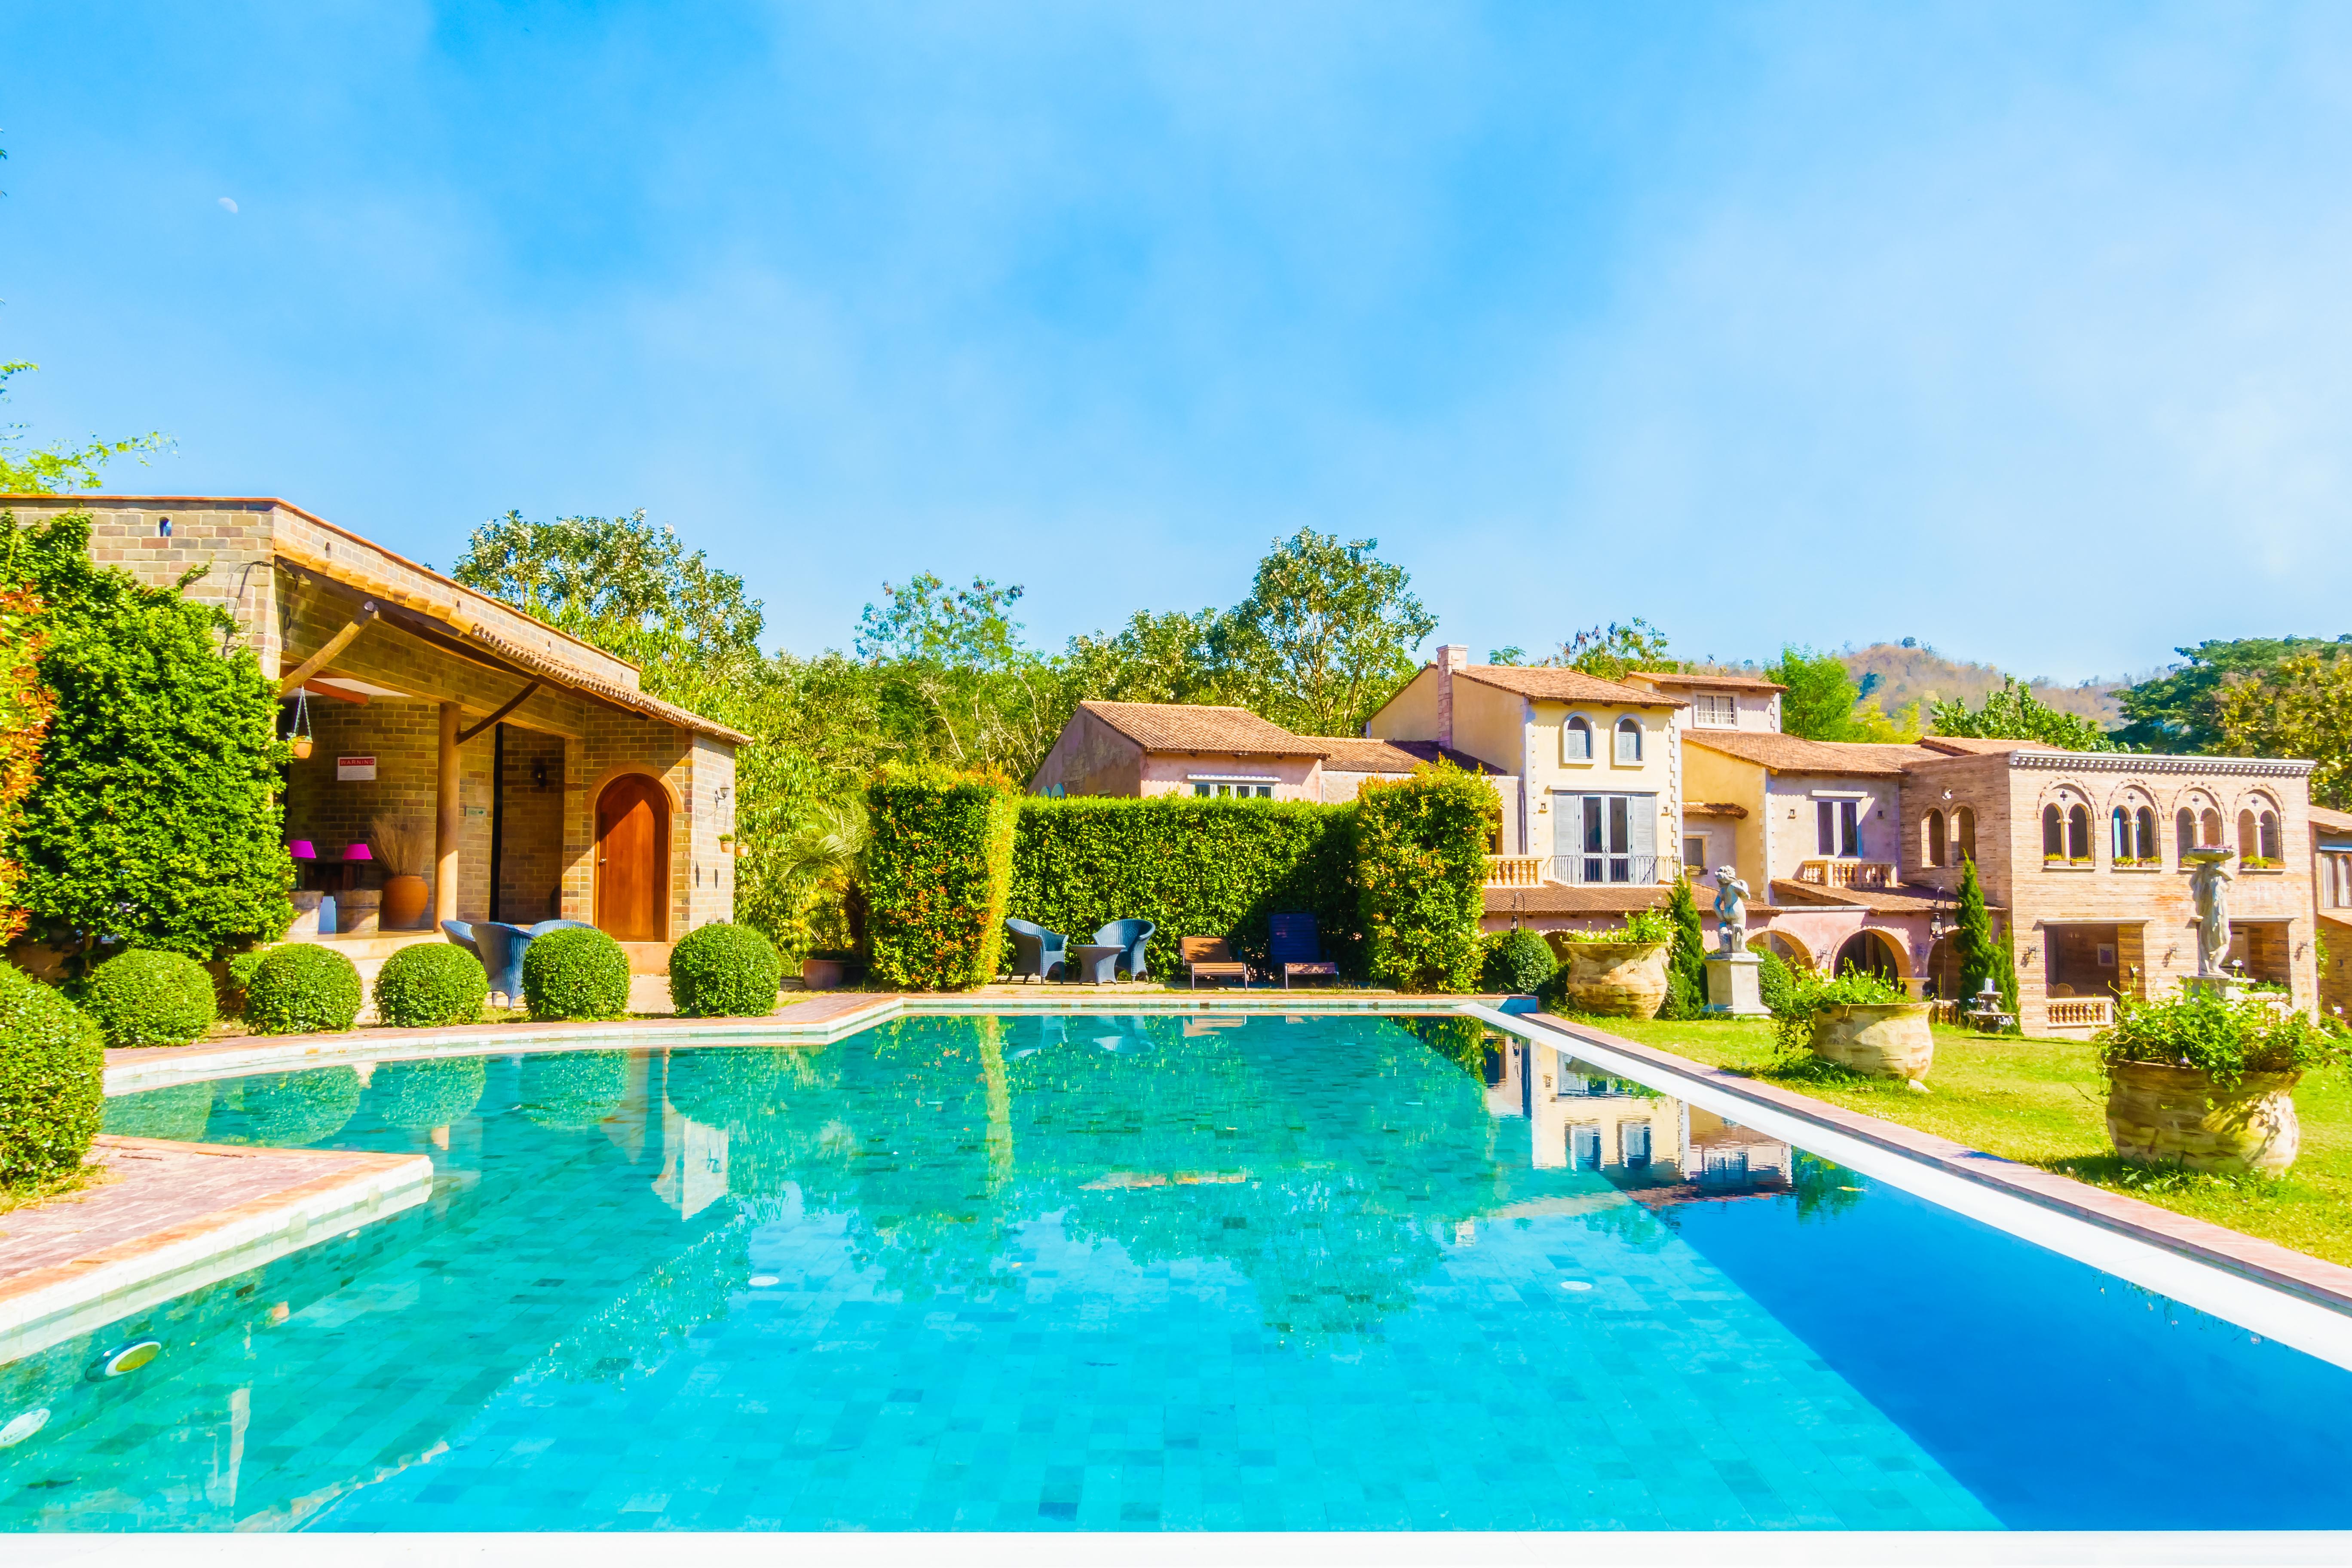 backyard-water-contemporary-architecture